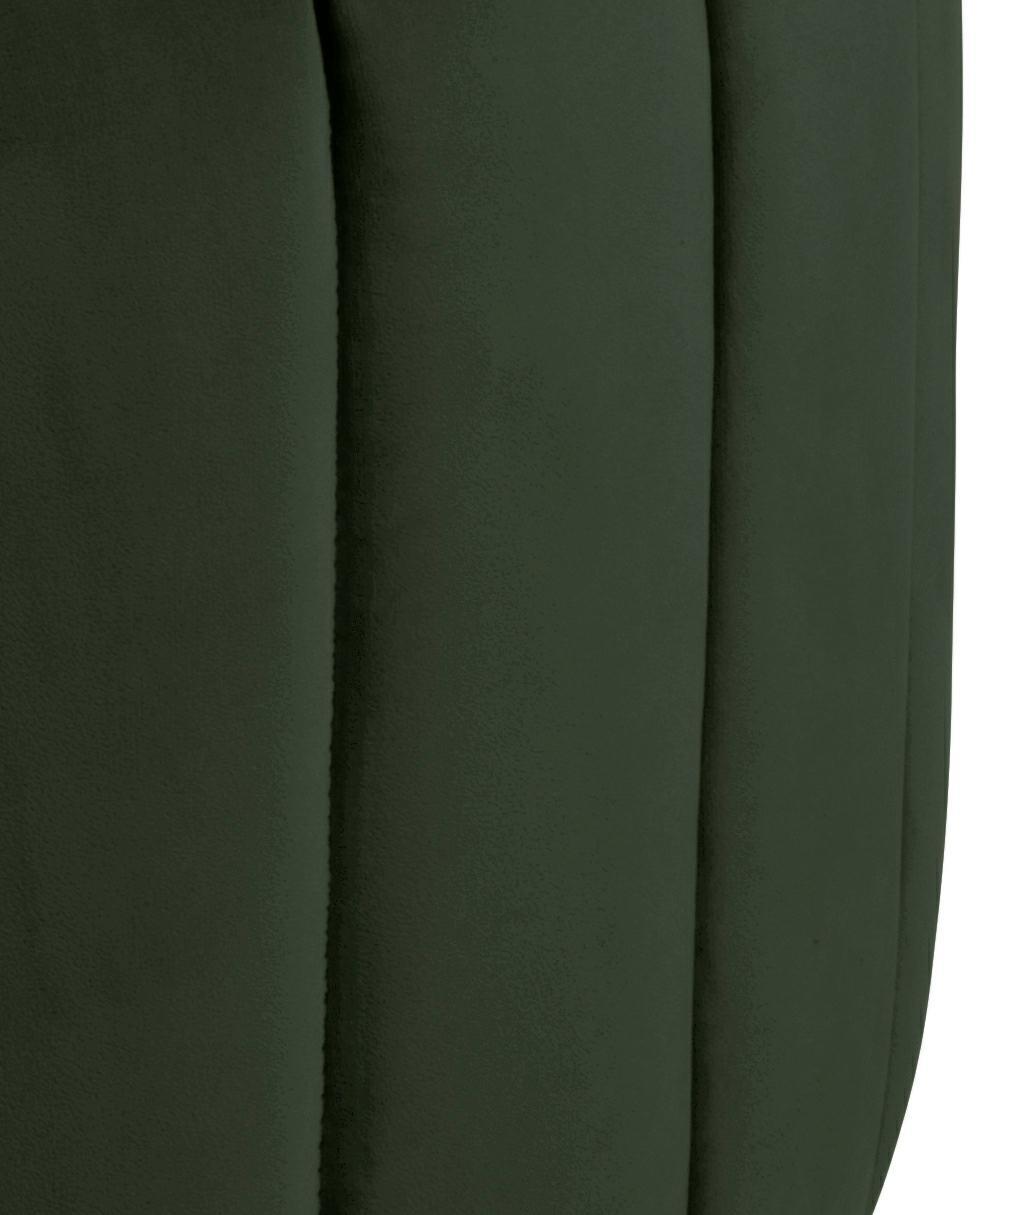 Pufa Doria VIC Dark green - zdjęcie nr 3